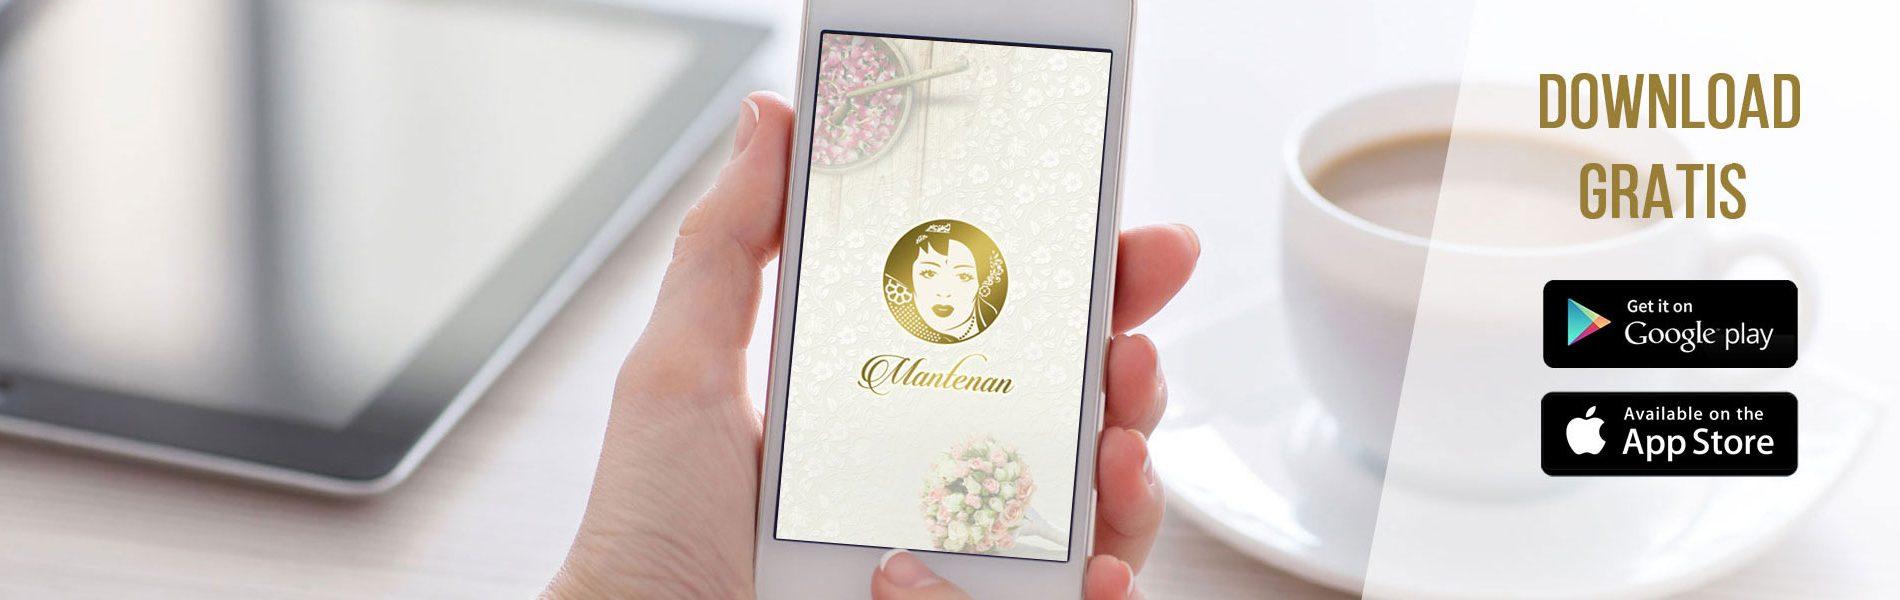 mantenan-download-slide